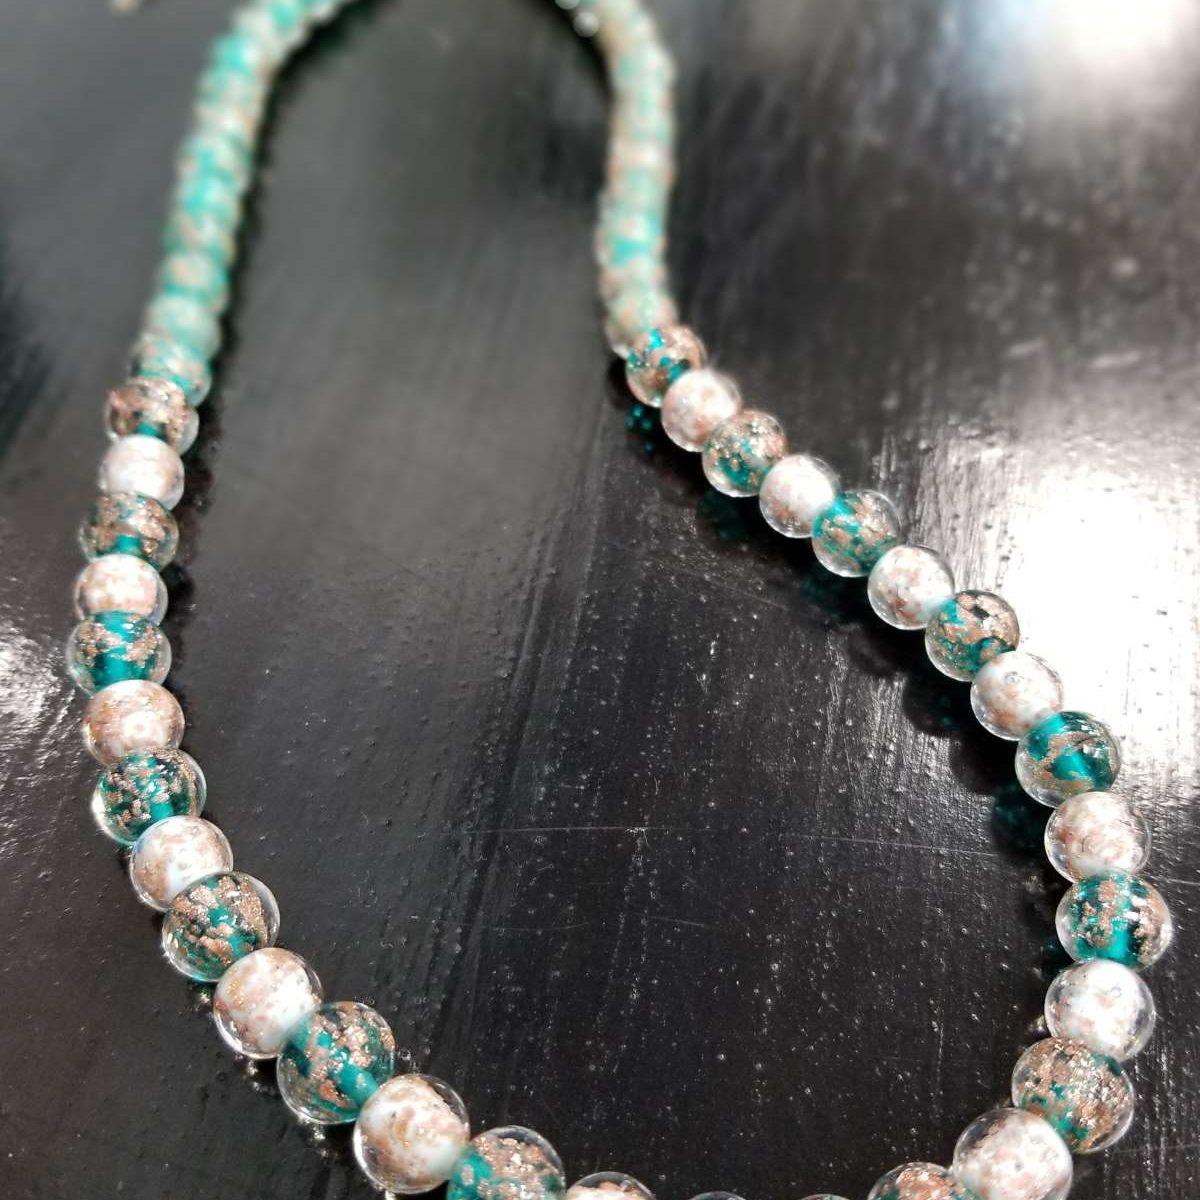 Murano glass beaded necklace